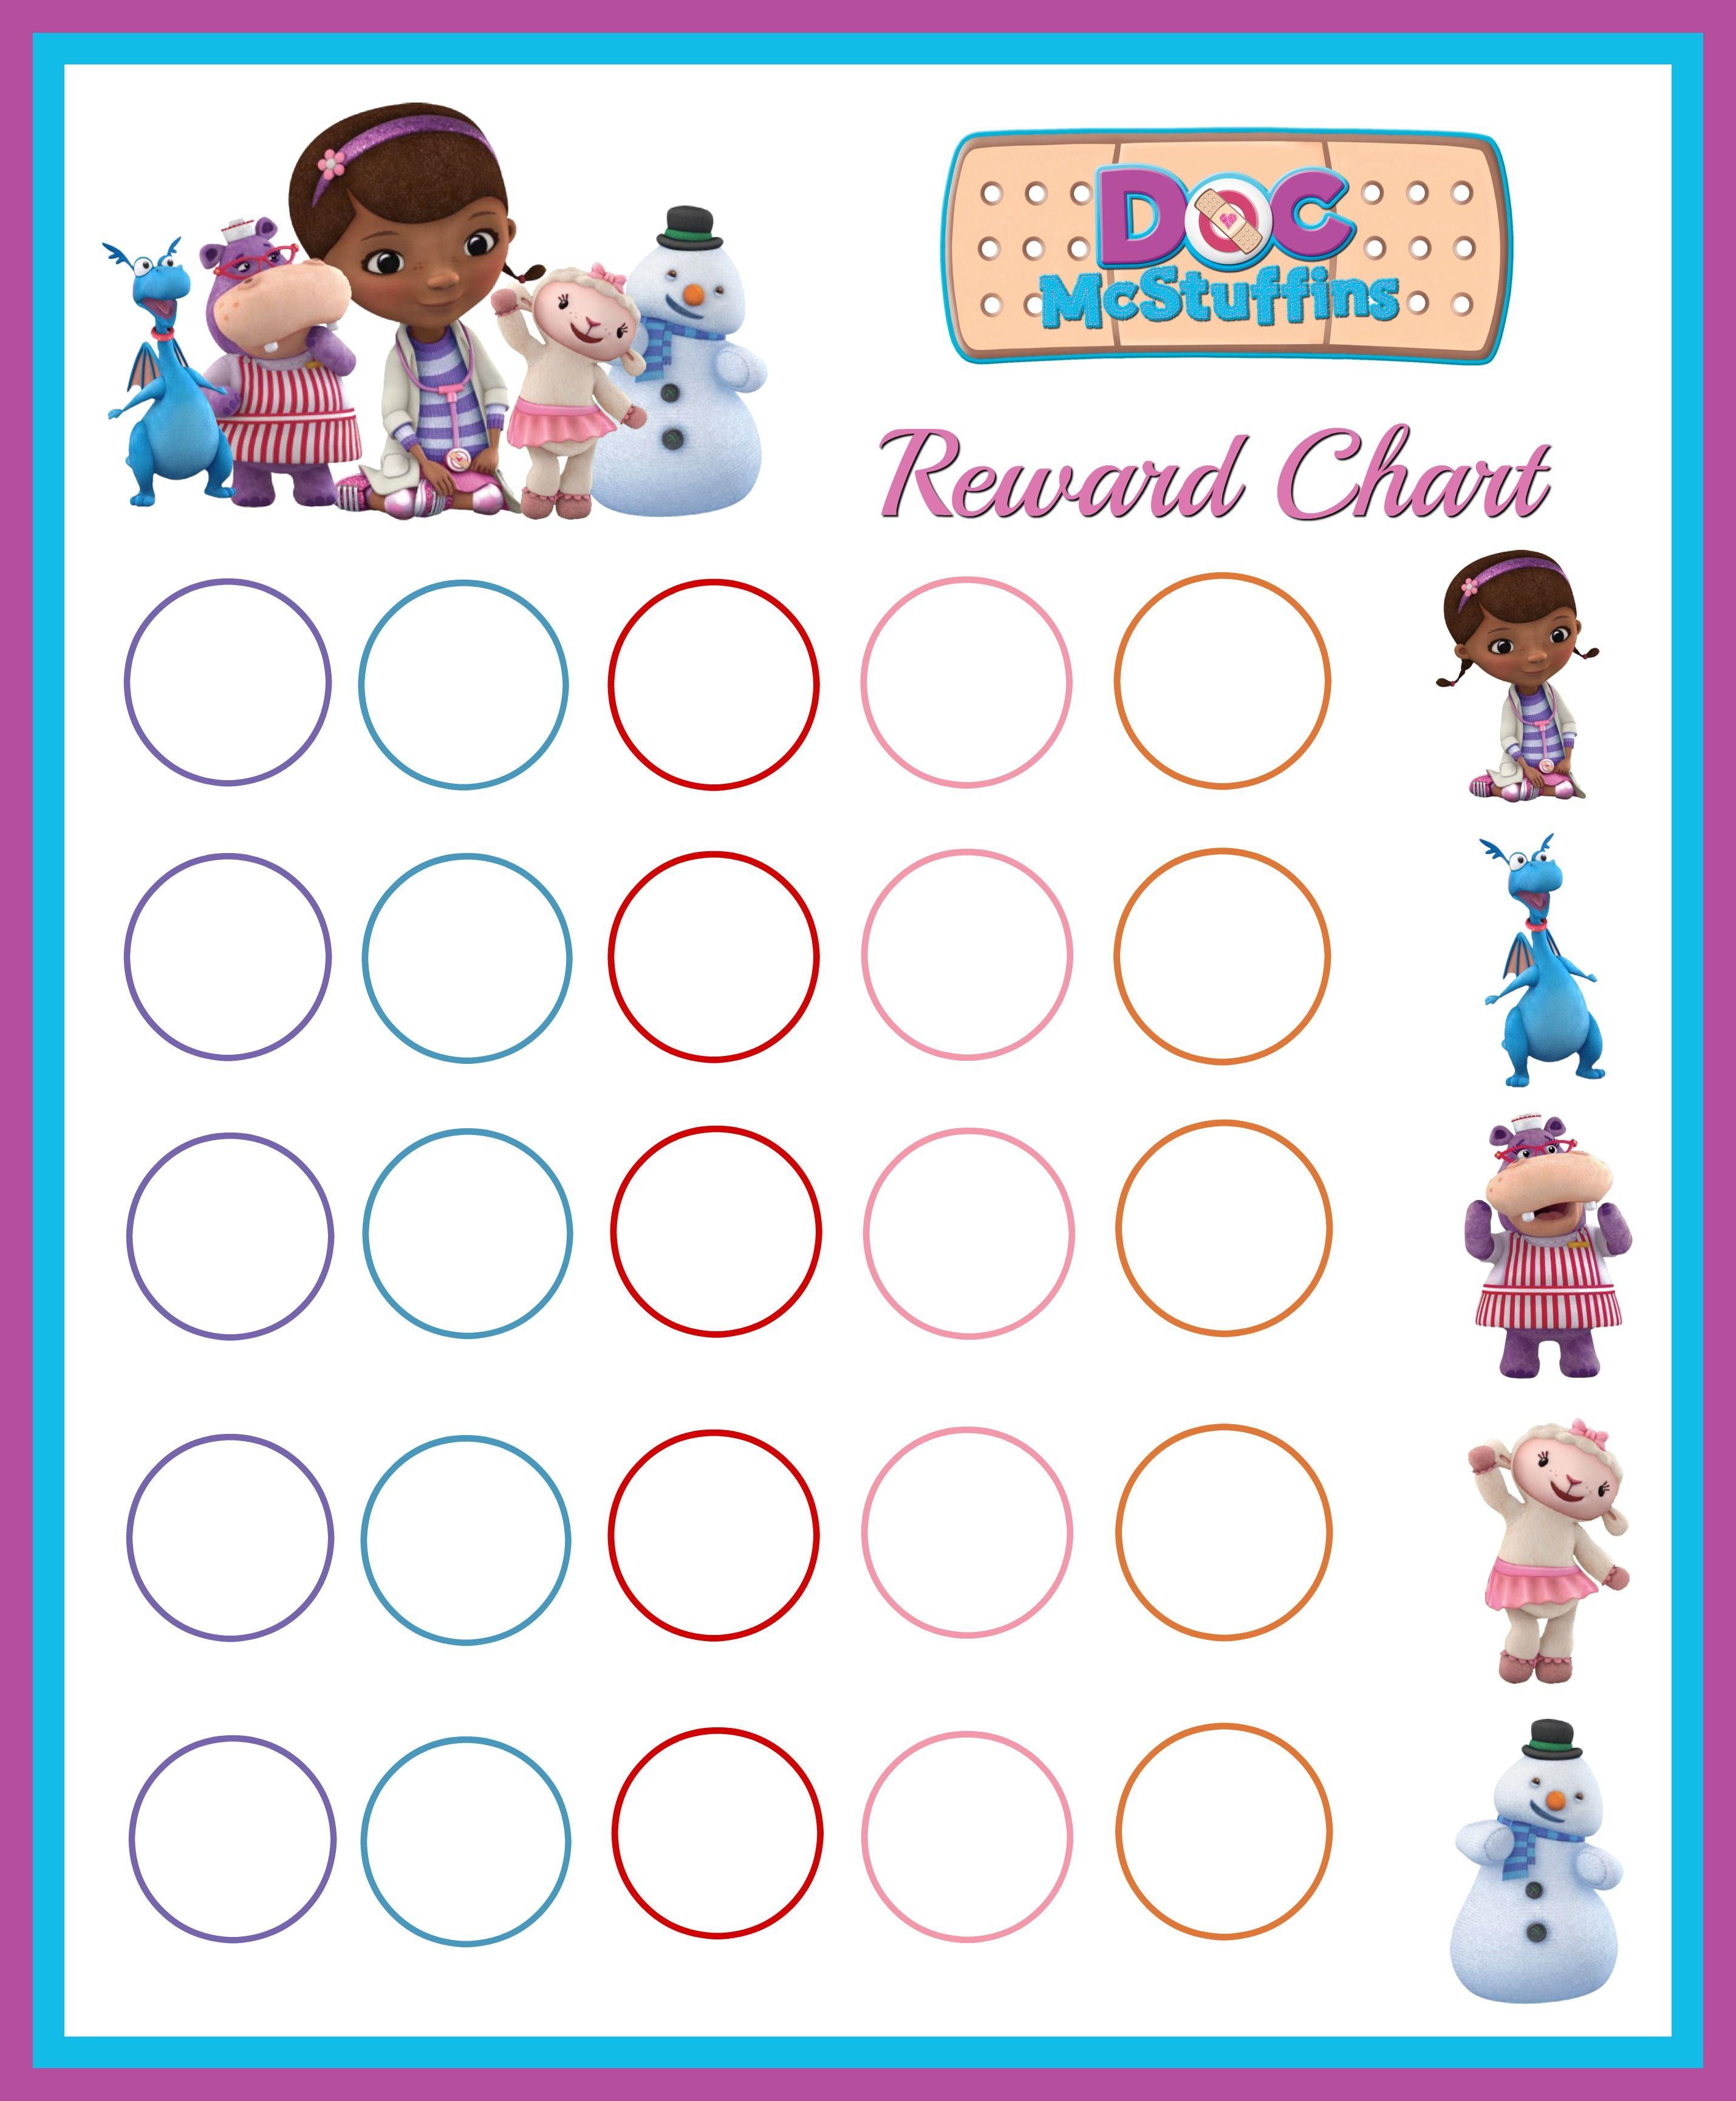 Doc McStuffins reward chart   Для детей   Pinterest   Dibujo